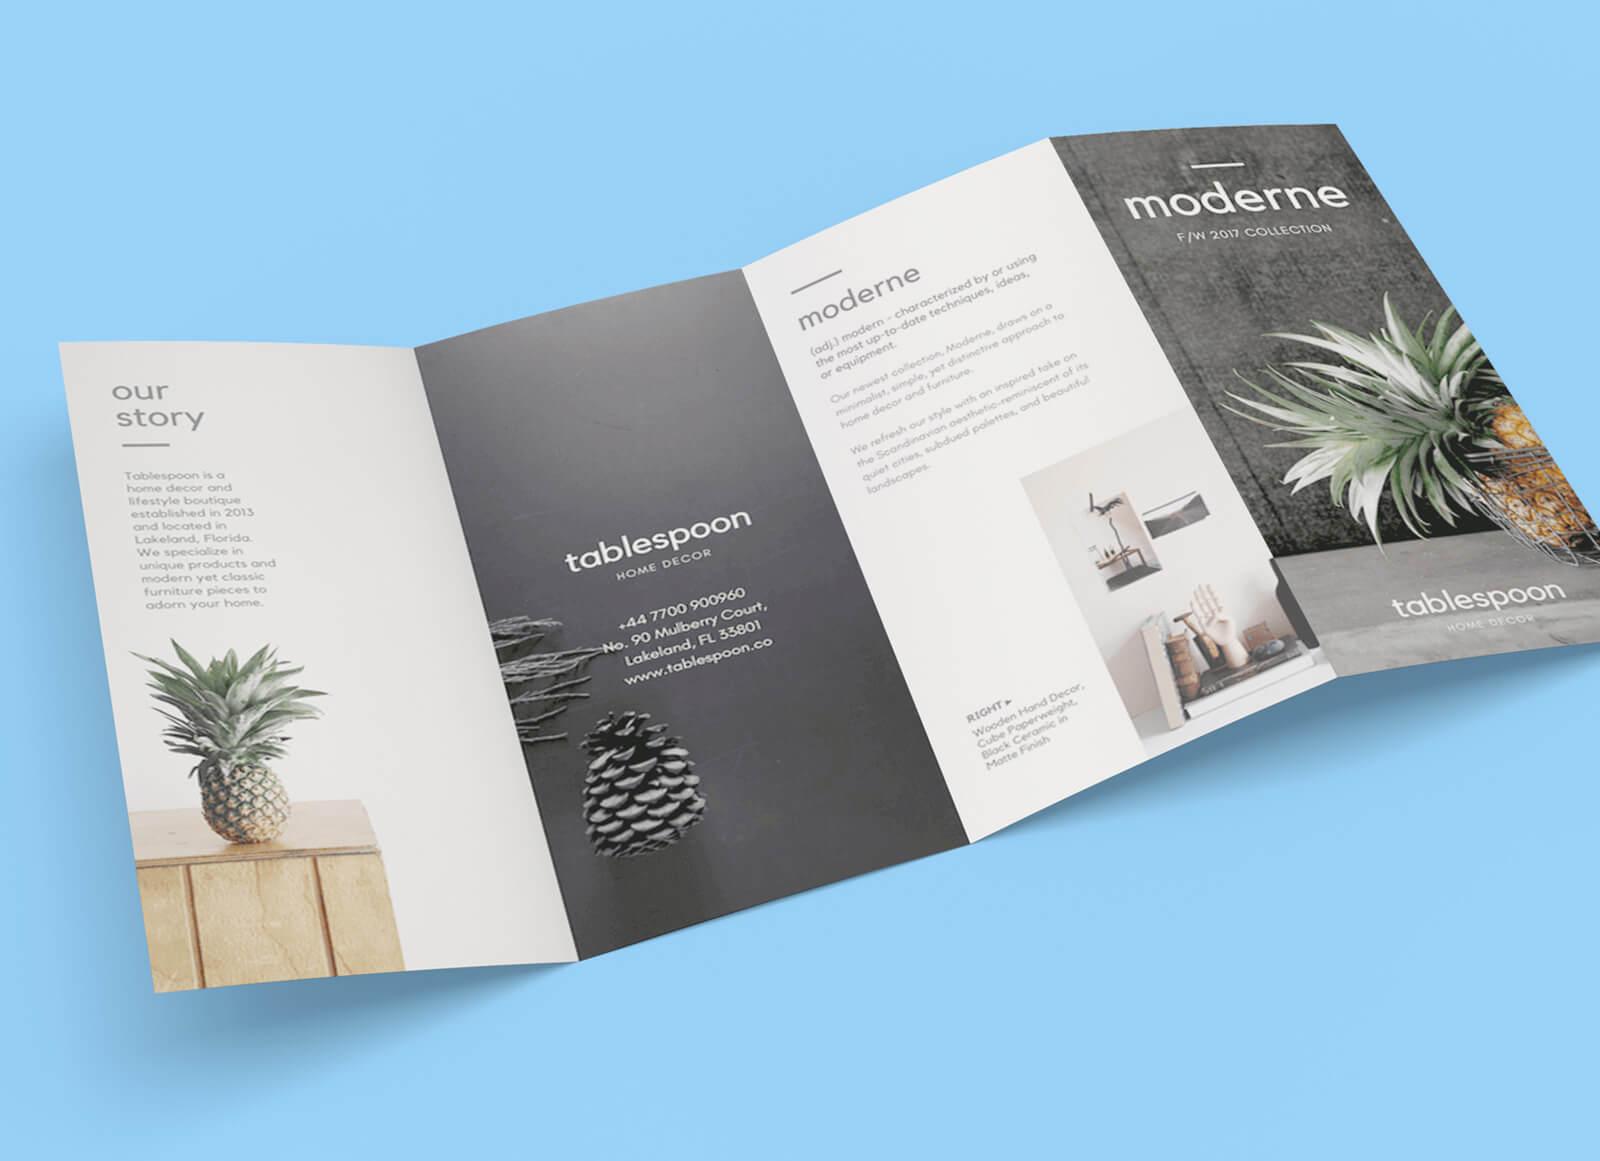 Free 4-Panel Quad-Fold Brochure Mockup Psd - Good Mockups intended for 4 Panel Brochure Template